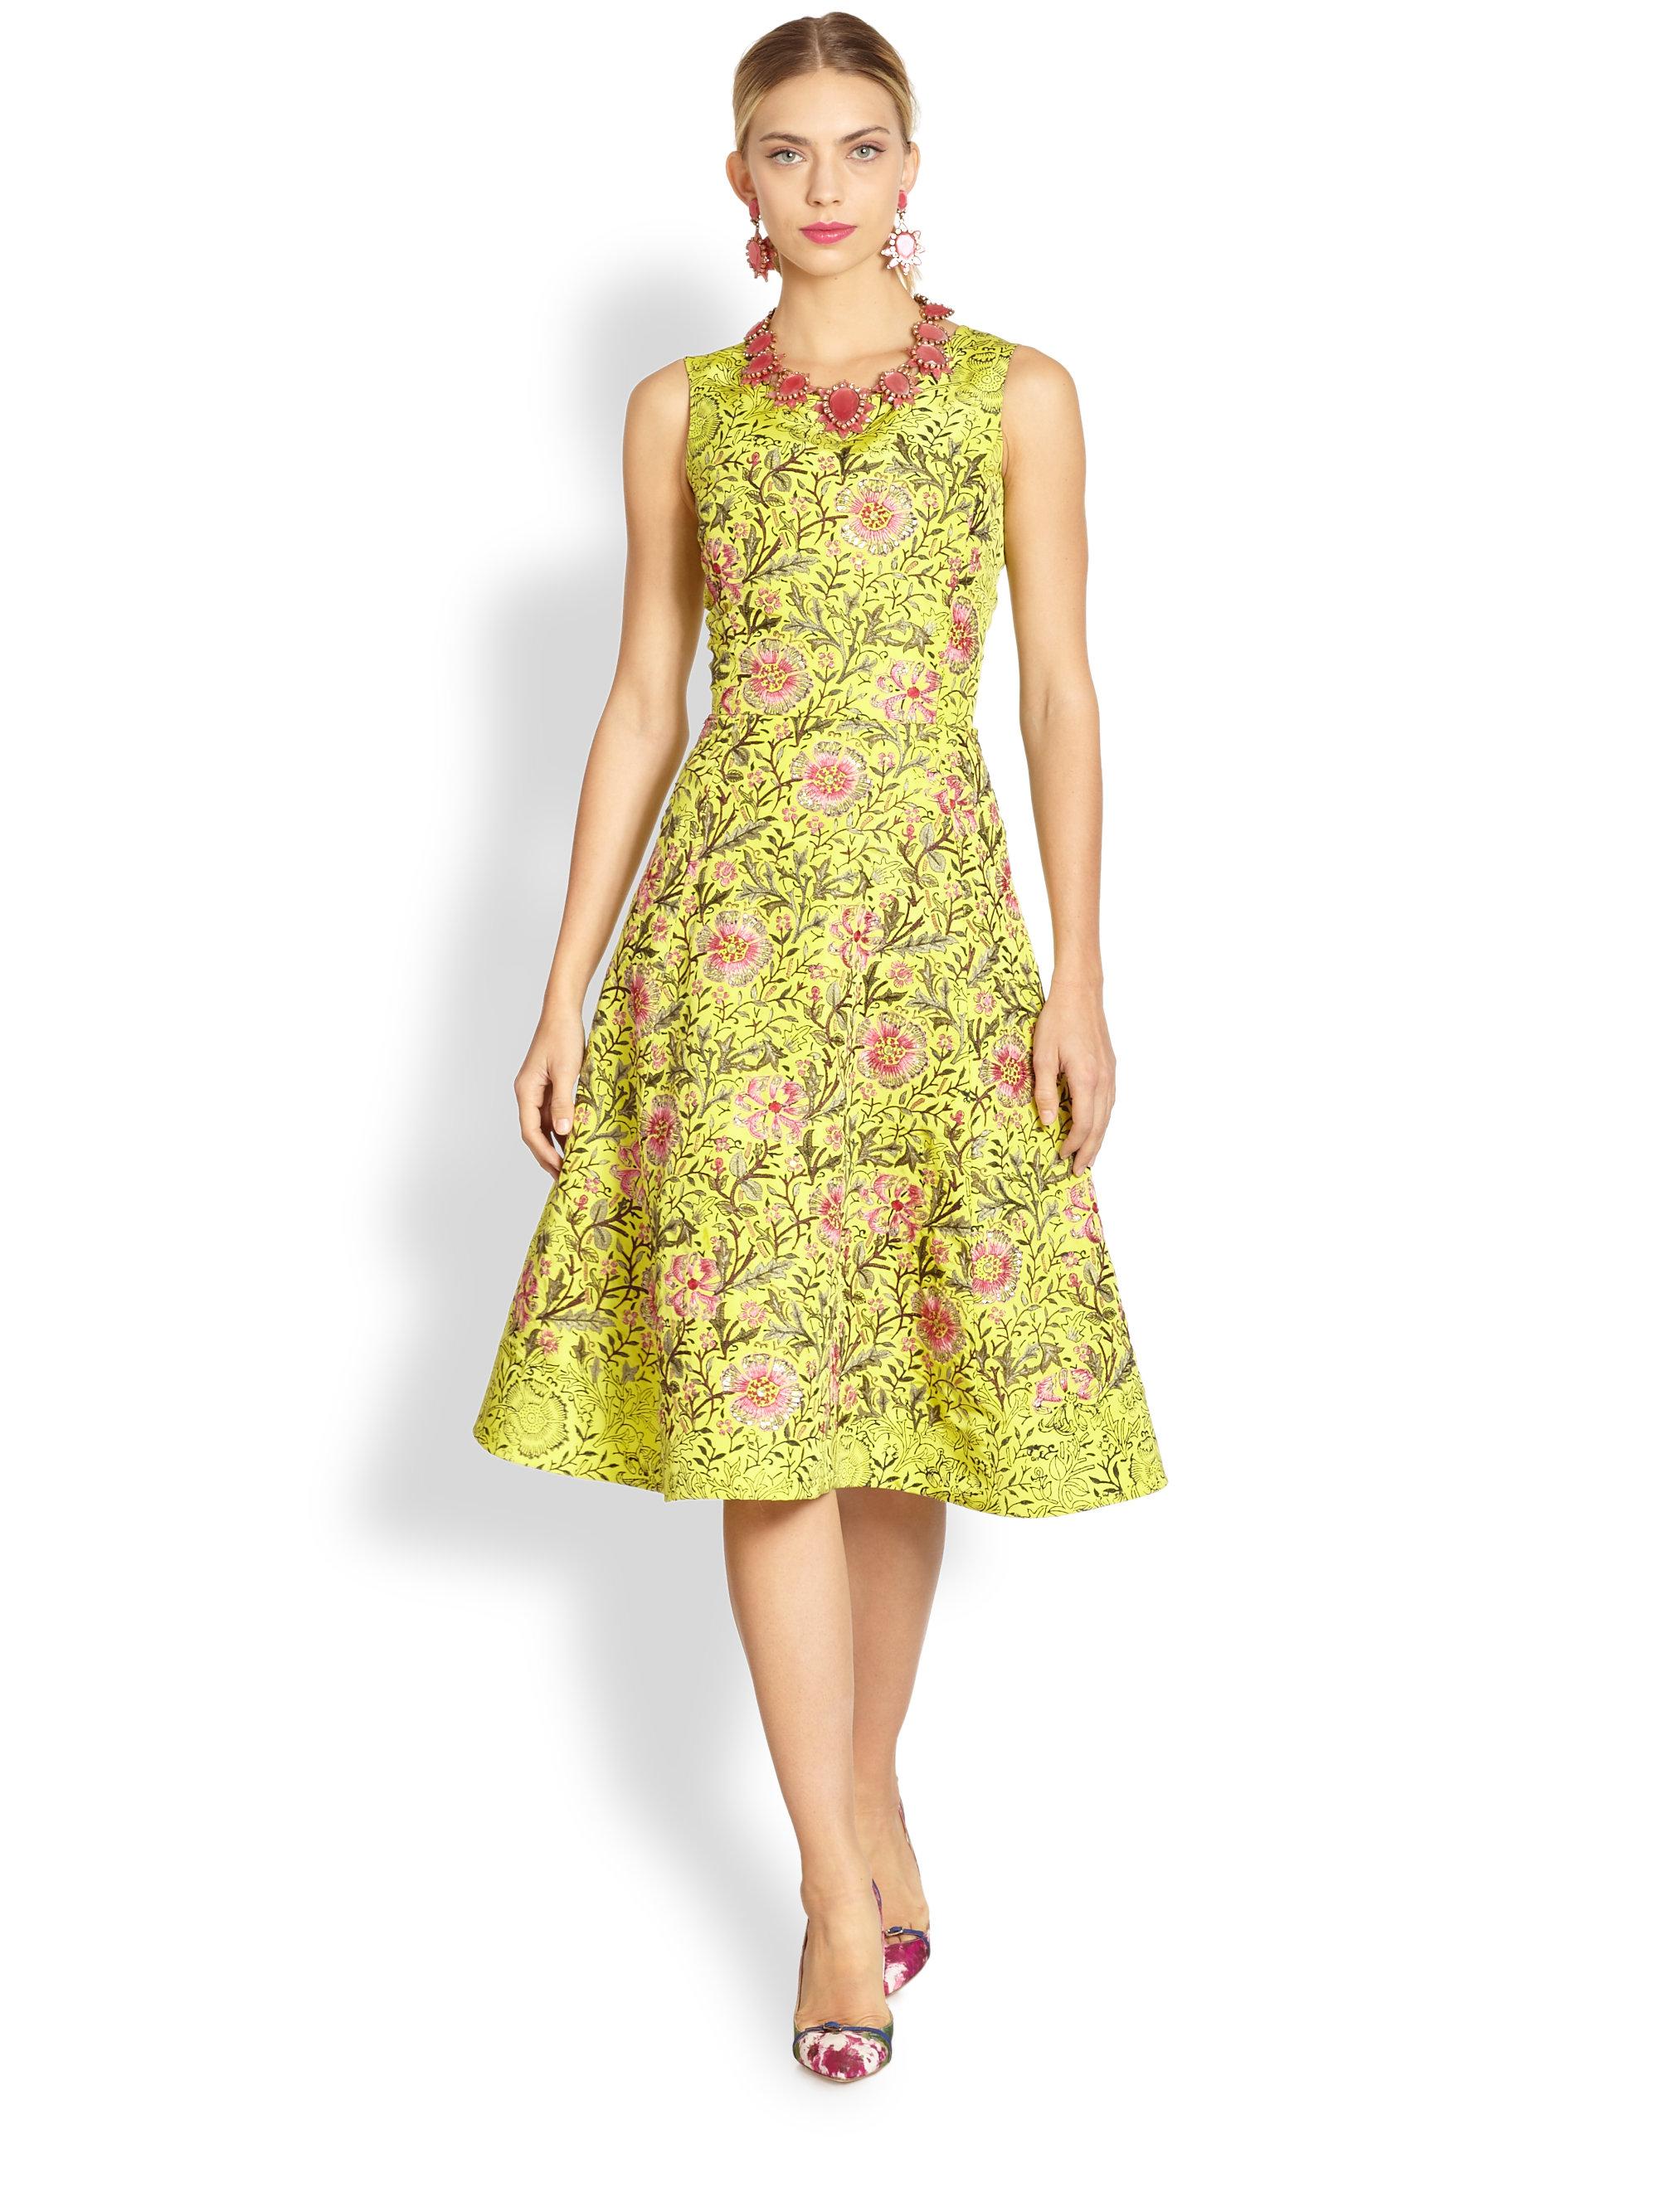 Oscar De La Renta Silk Floral Embroidery Dress In Yellow